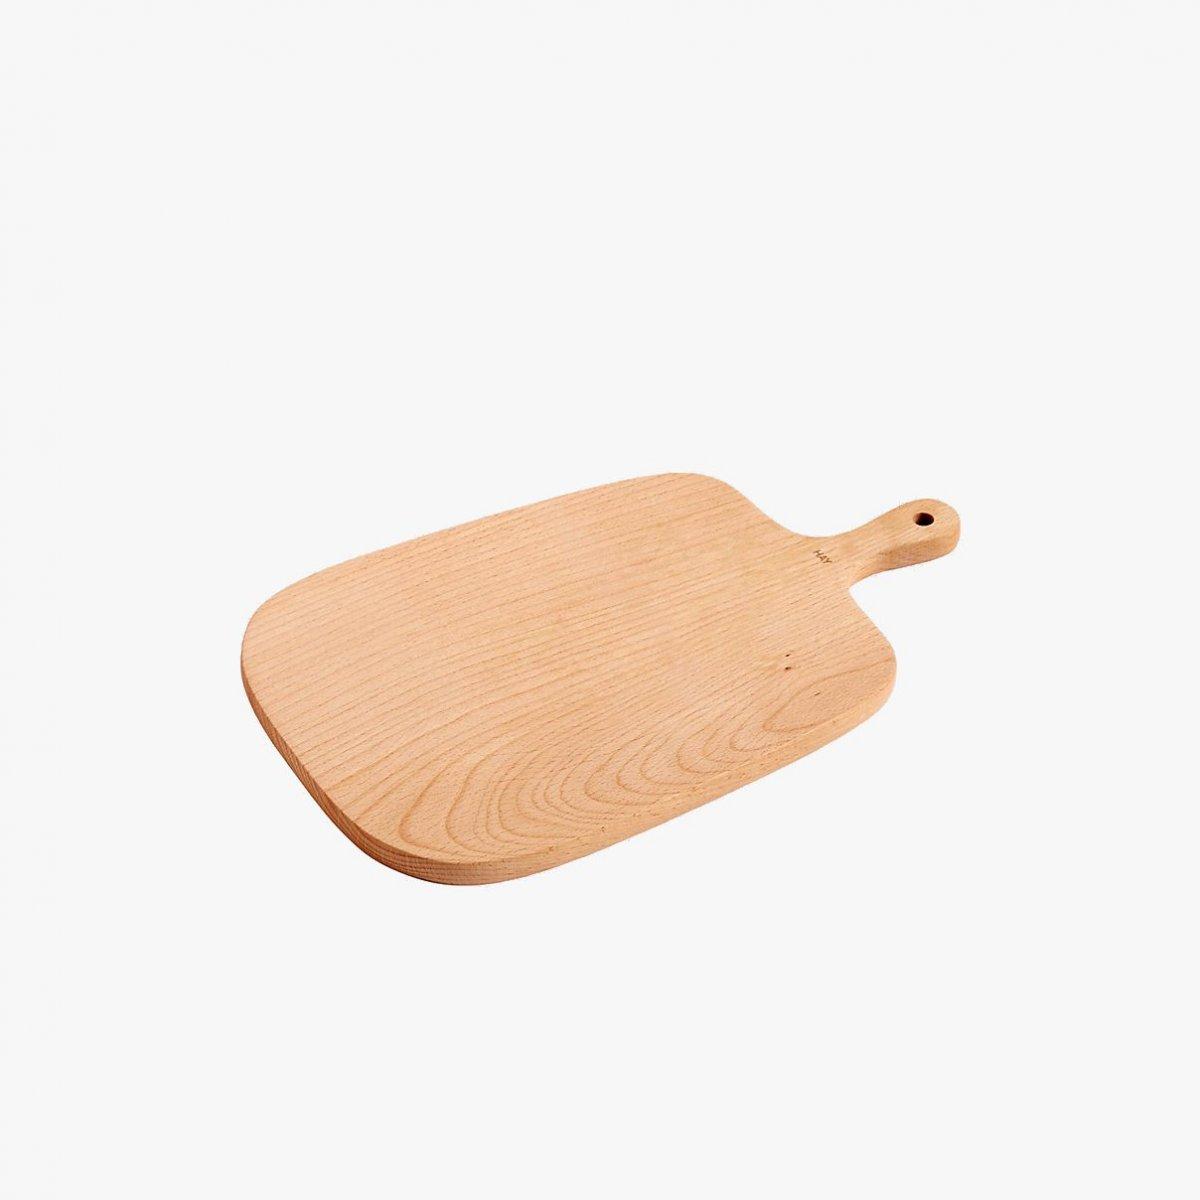 Plank Cutting Board, Rectangular, medium.